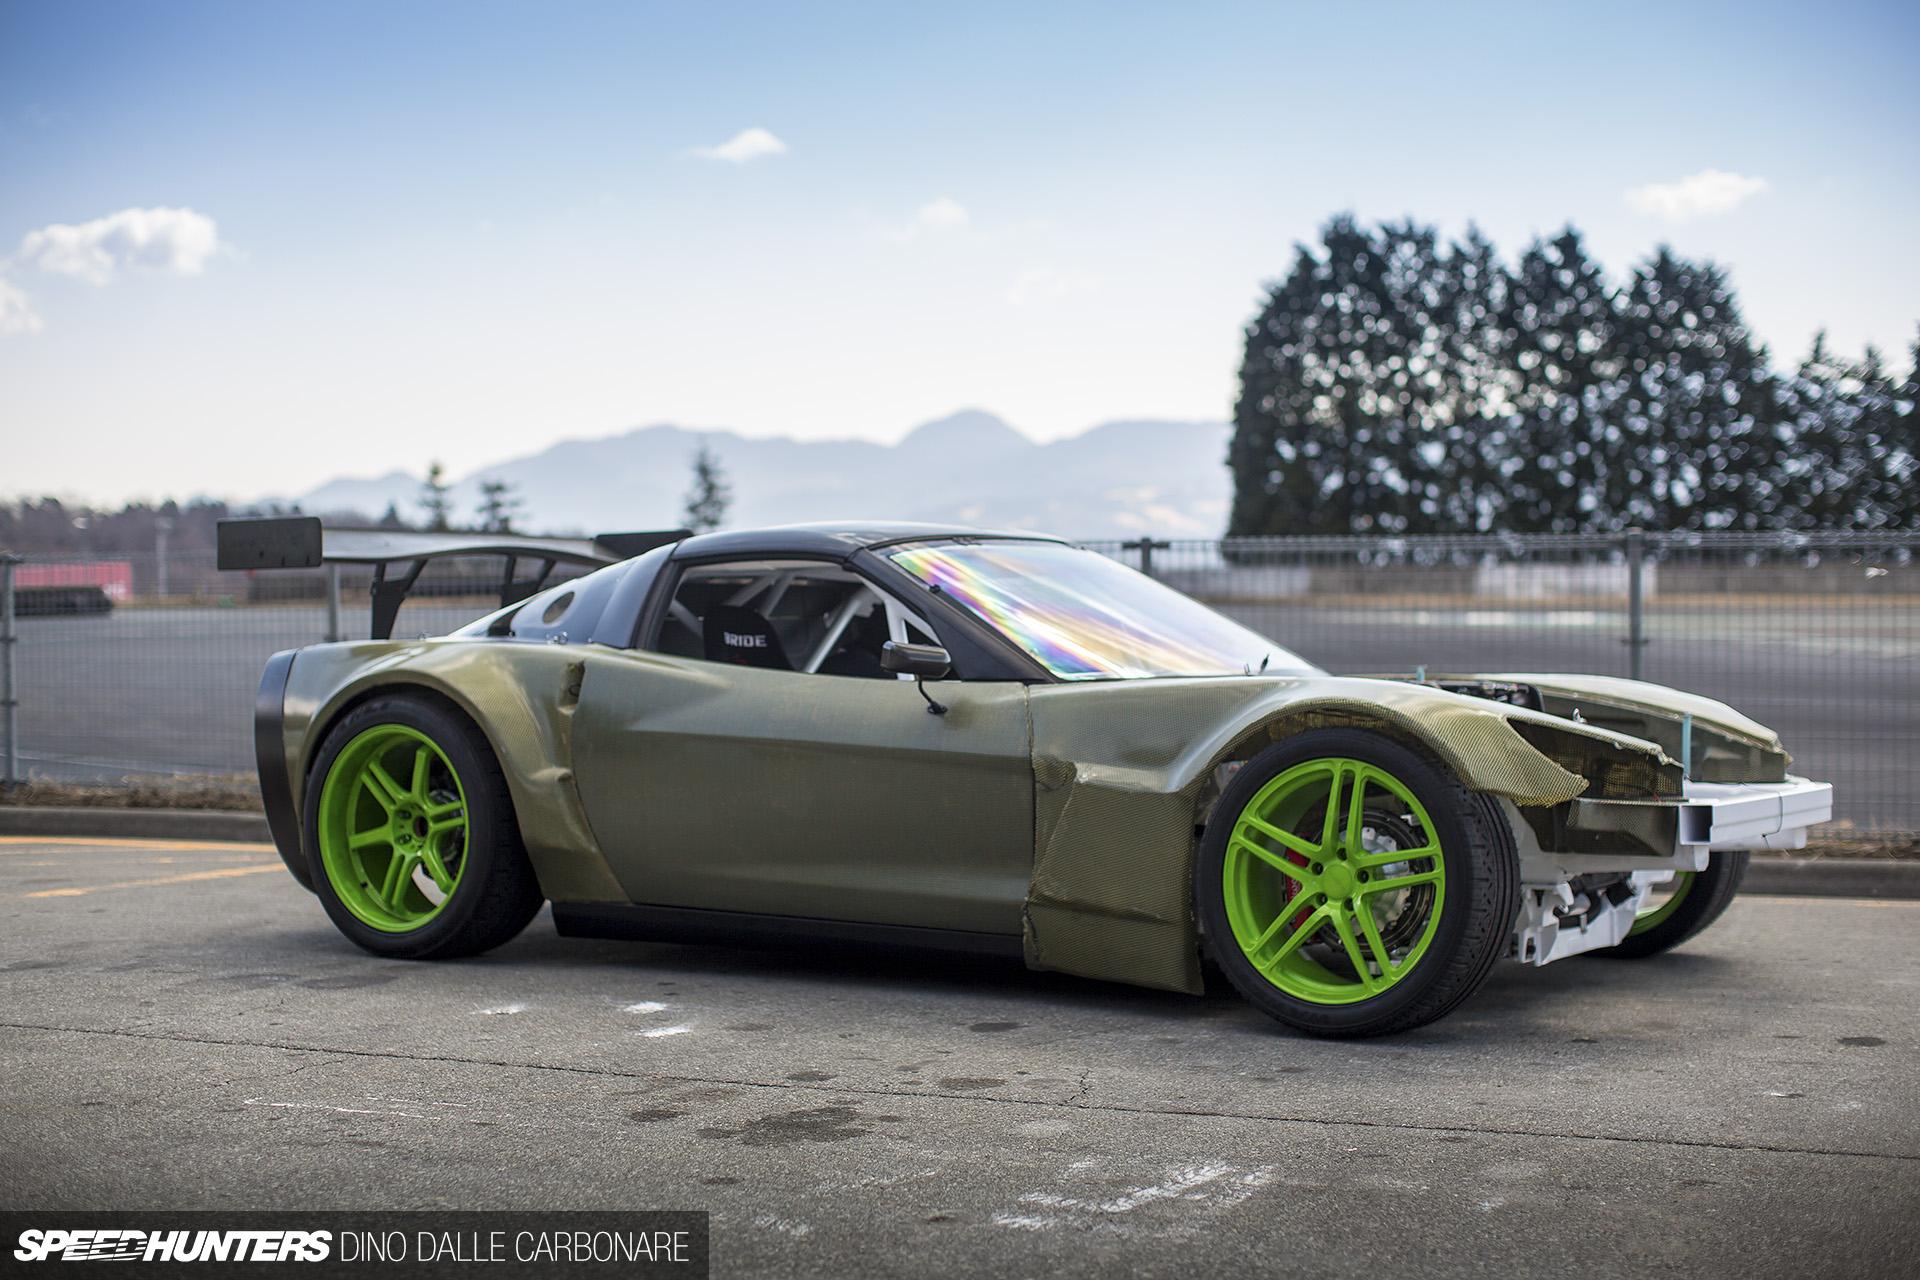 Sport Car Race Corvette Grand